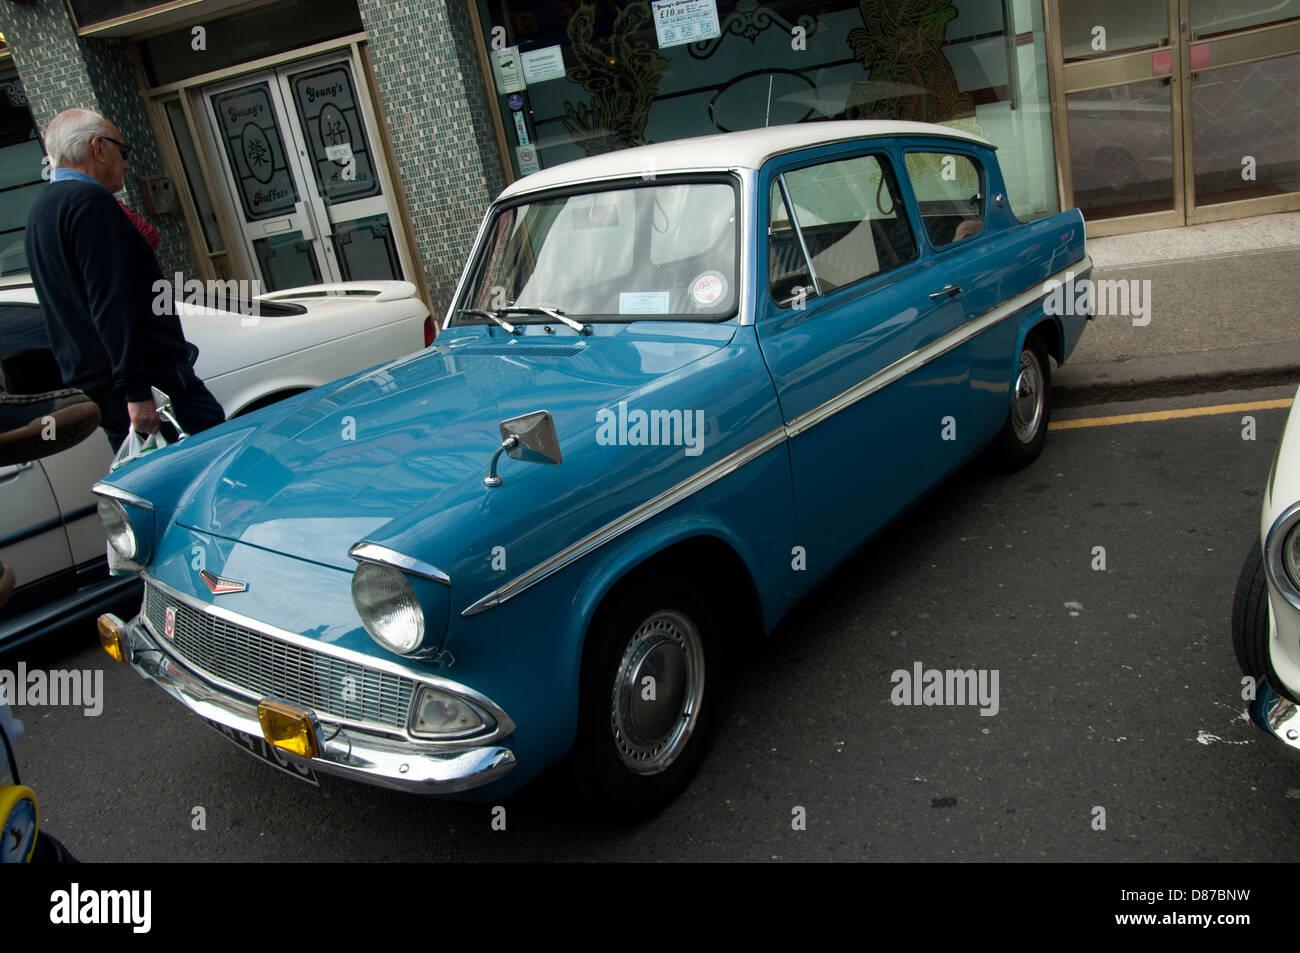 Ford Anglia Stock Photos & Ford Anglia Stock Images - Alamy